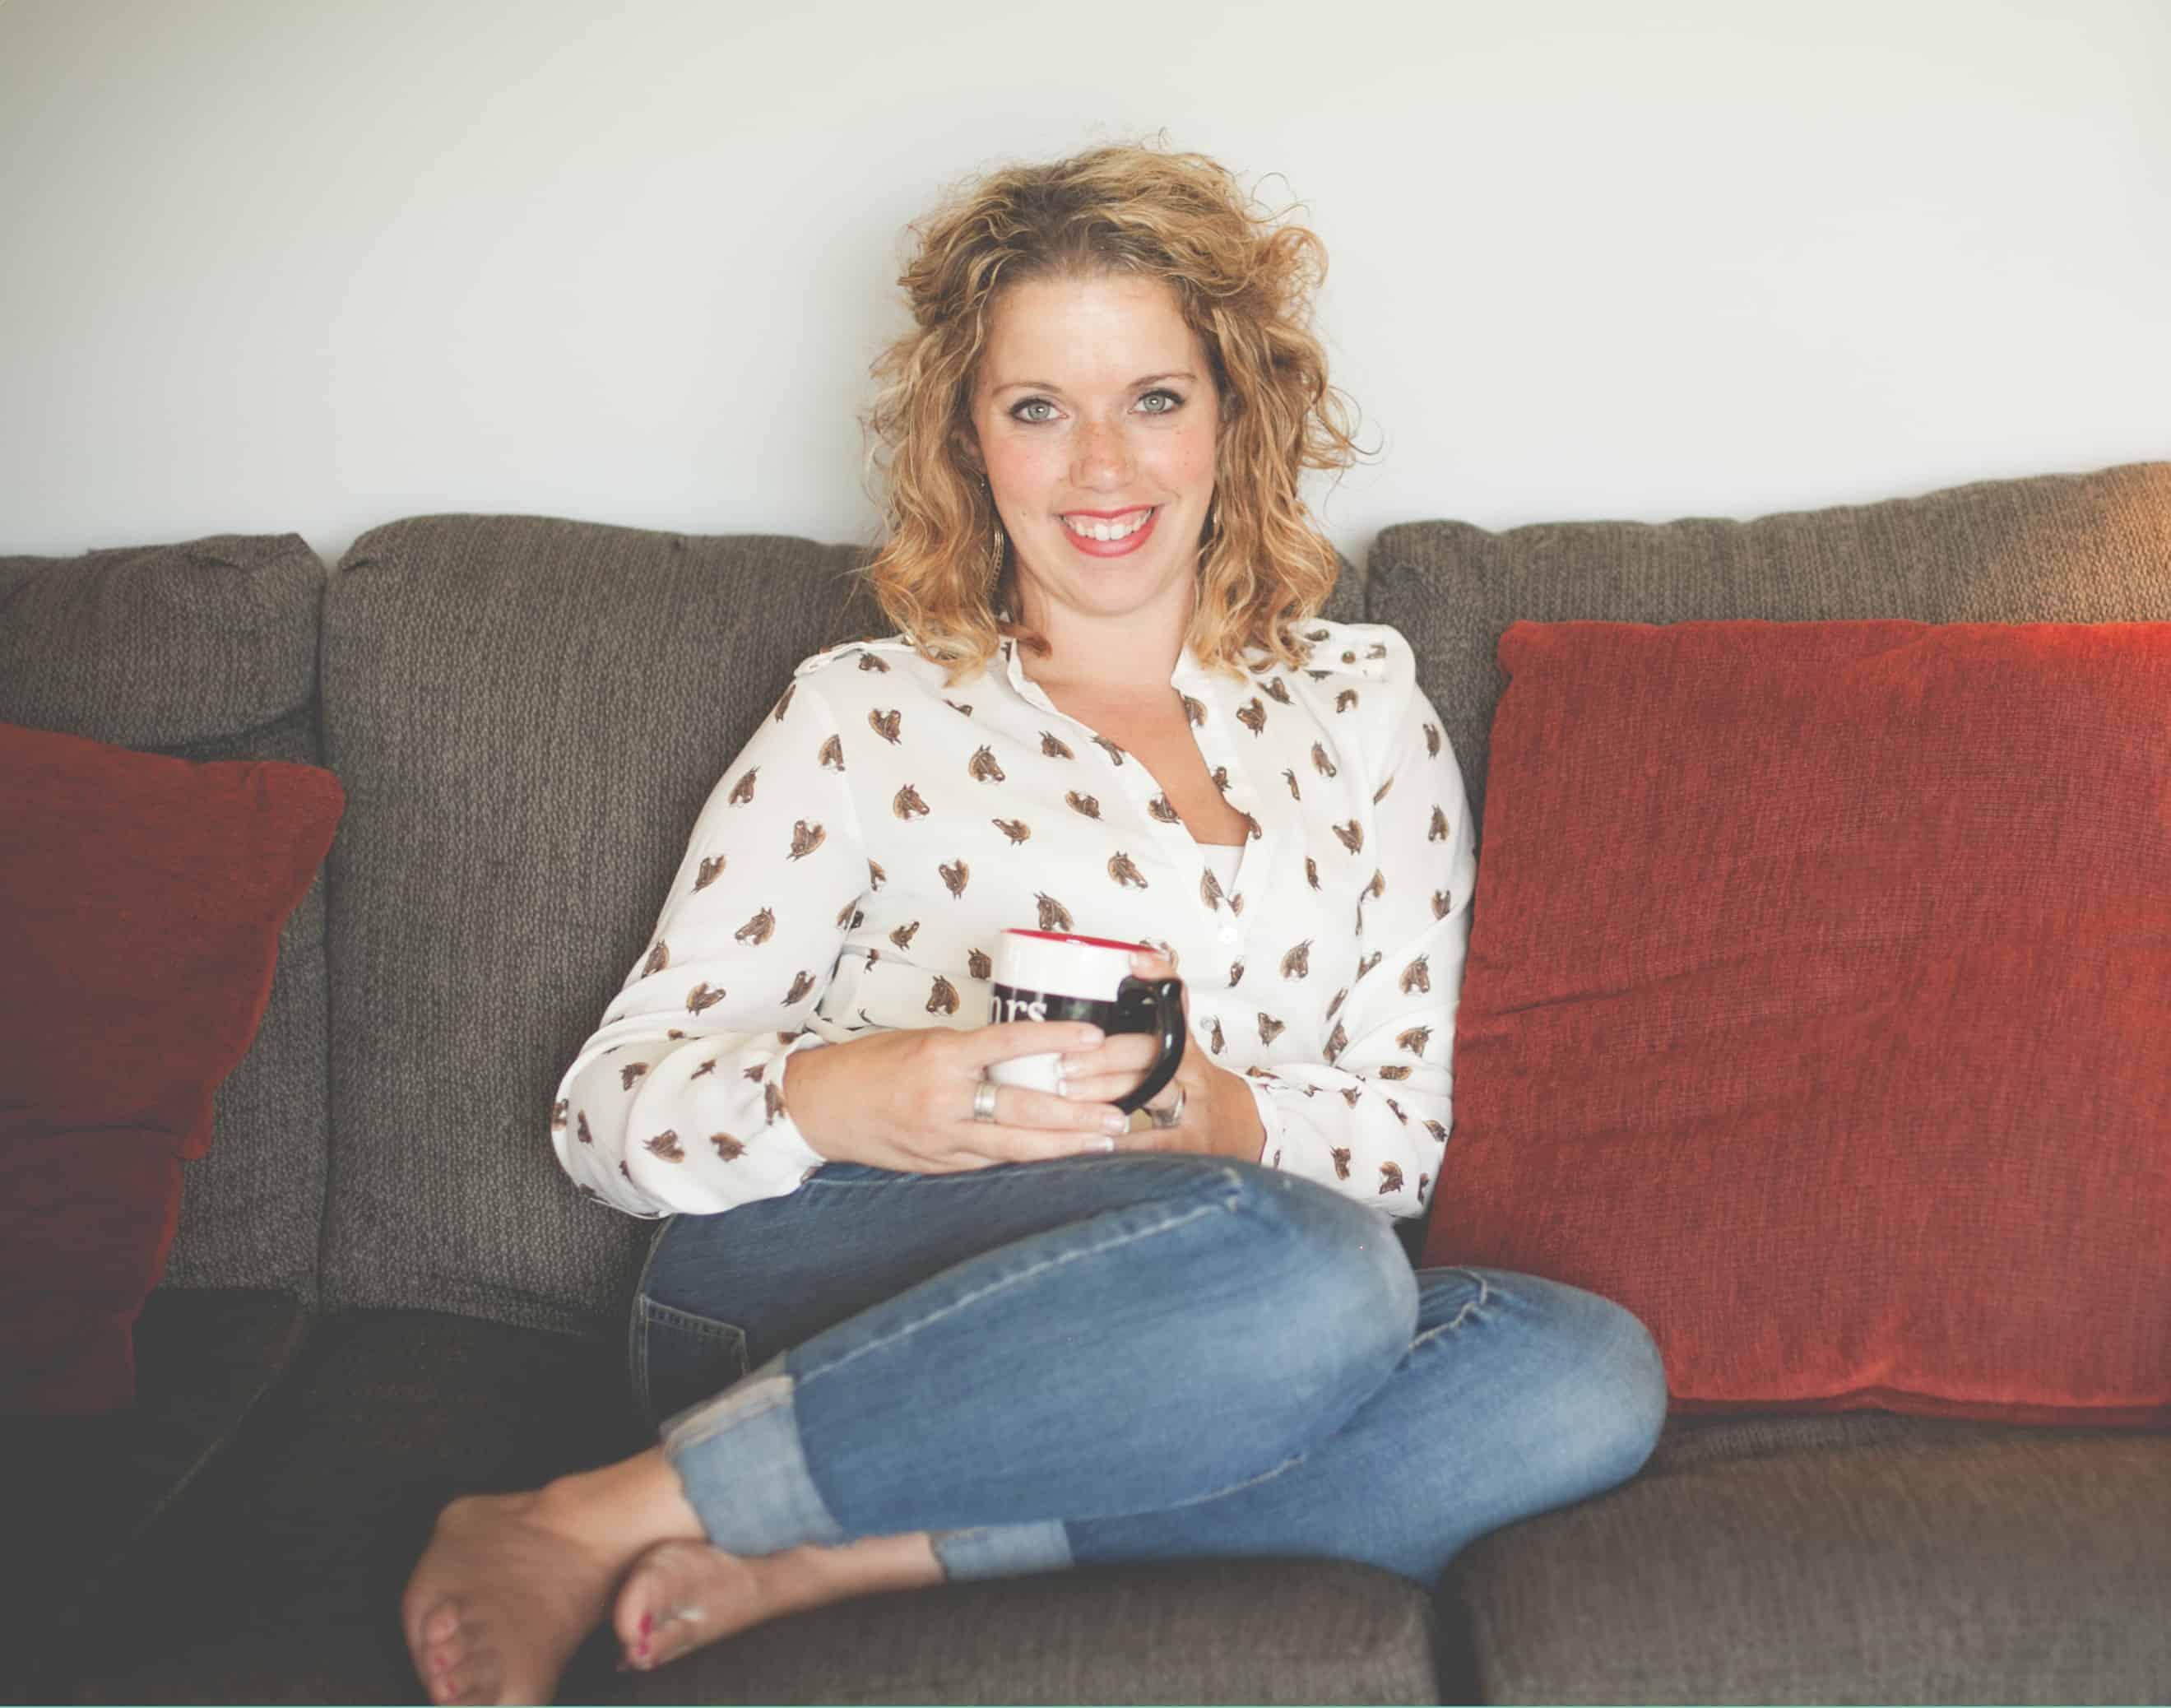 boss mom of the week: mallory schlabach - boss-mom